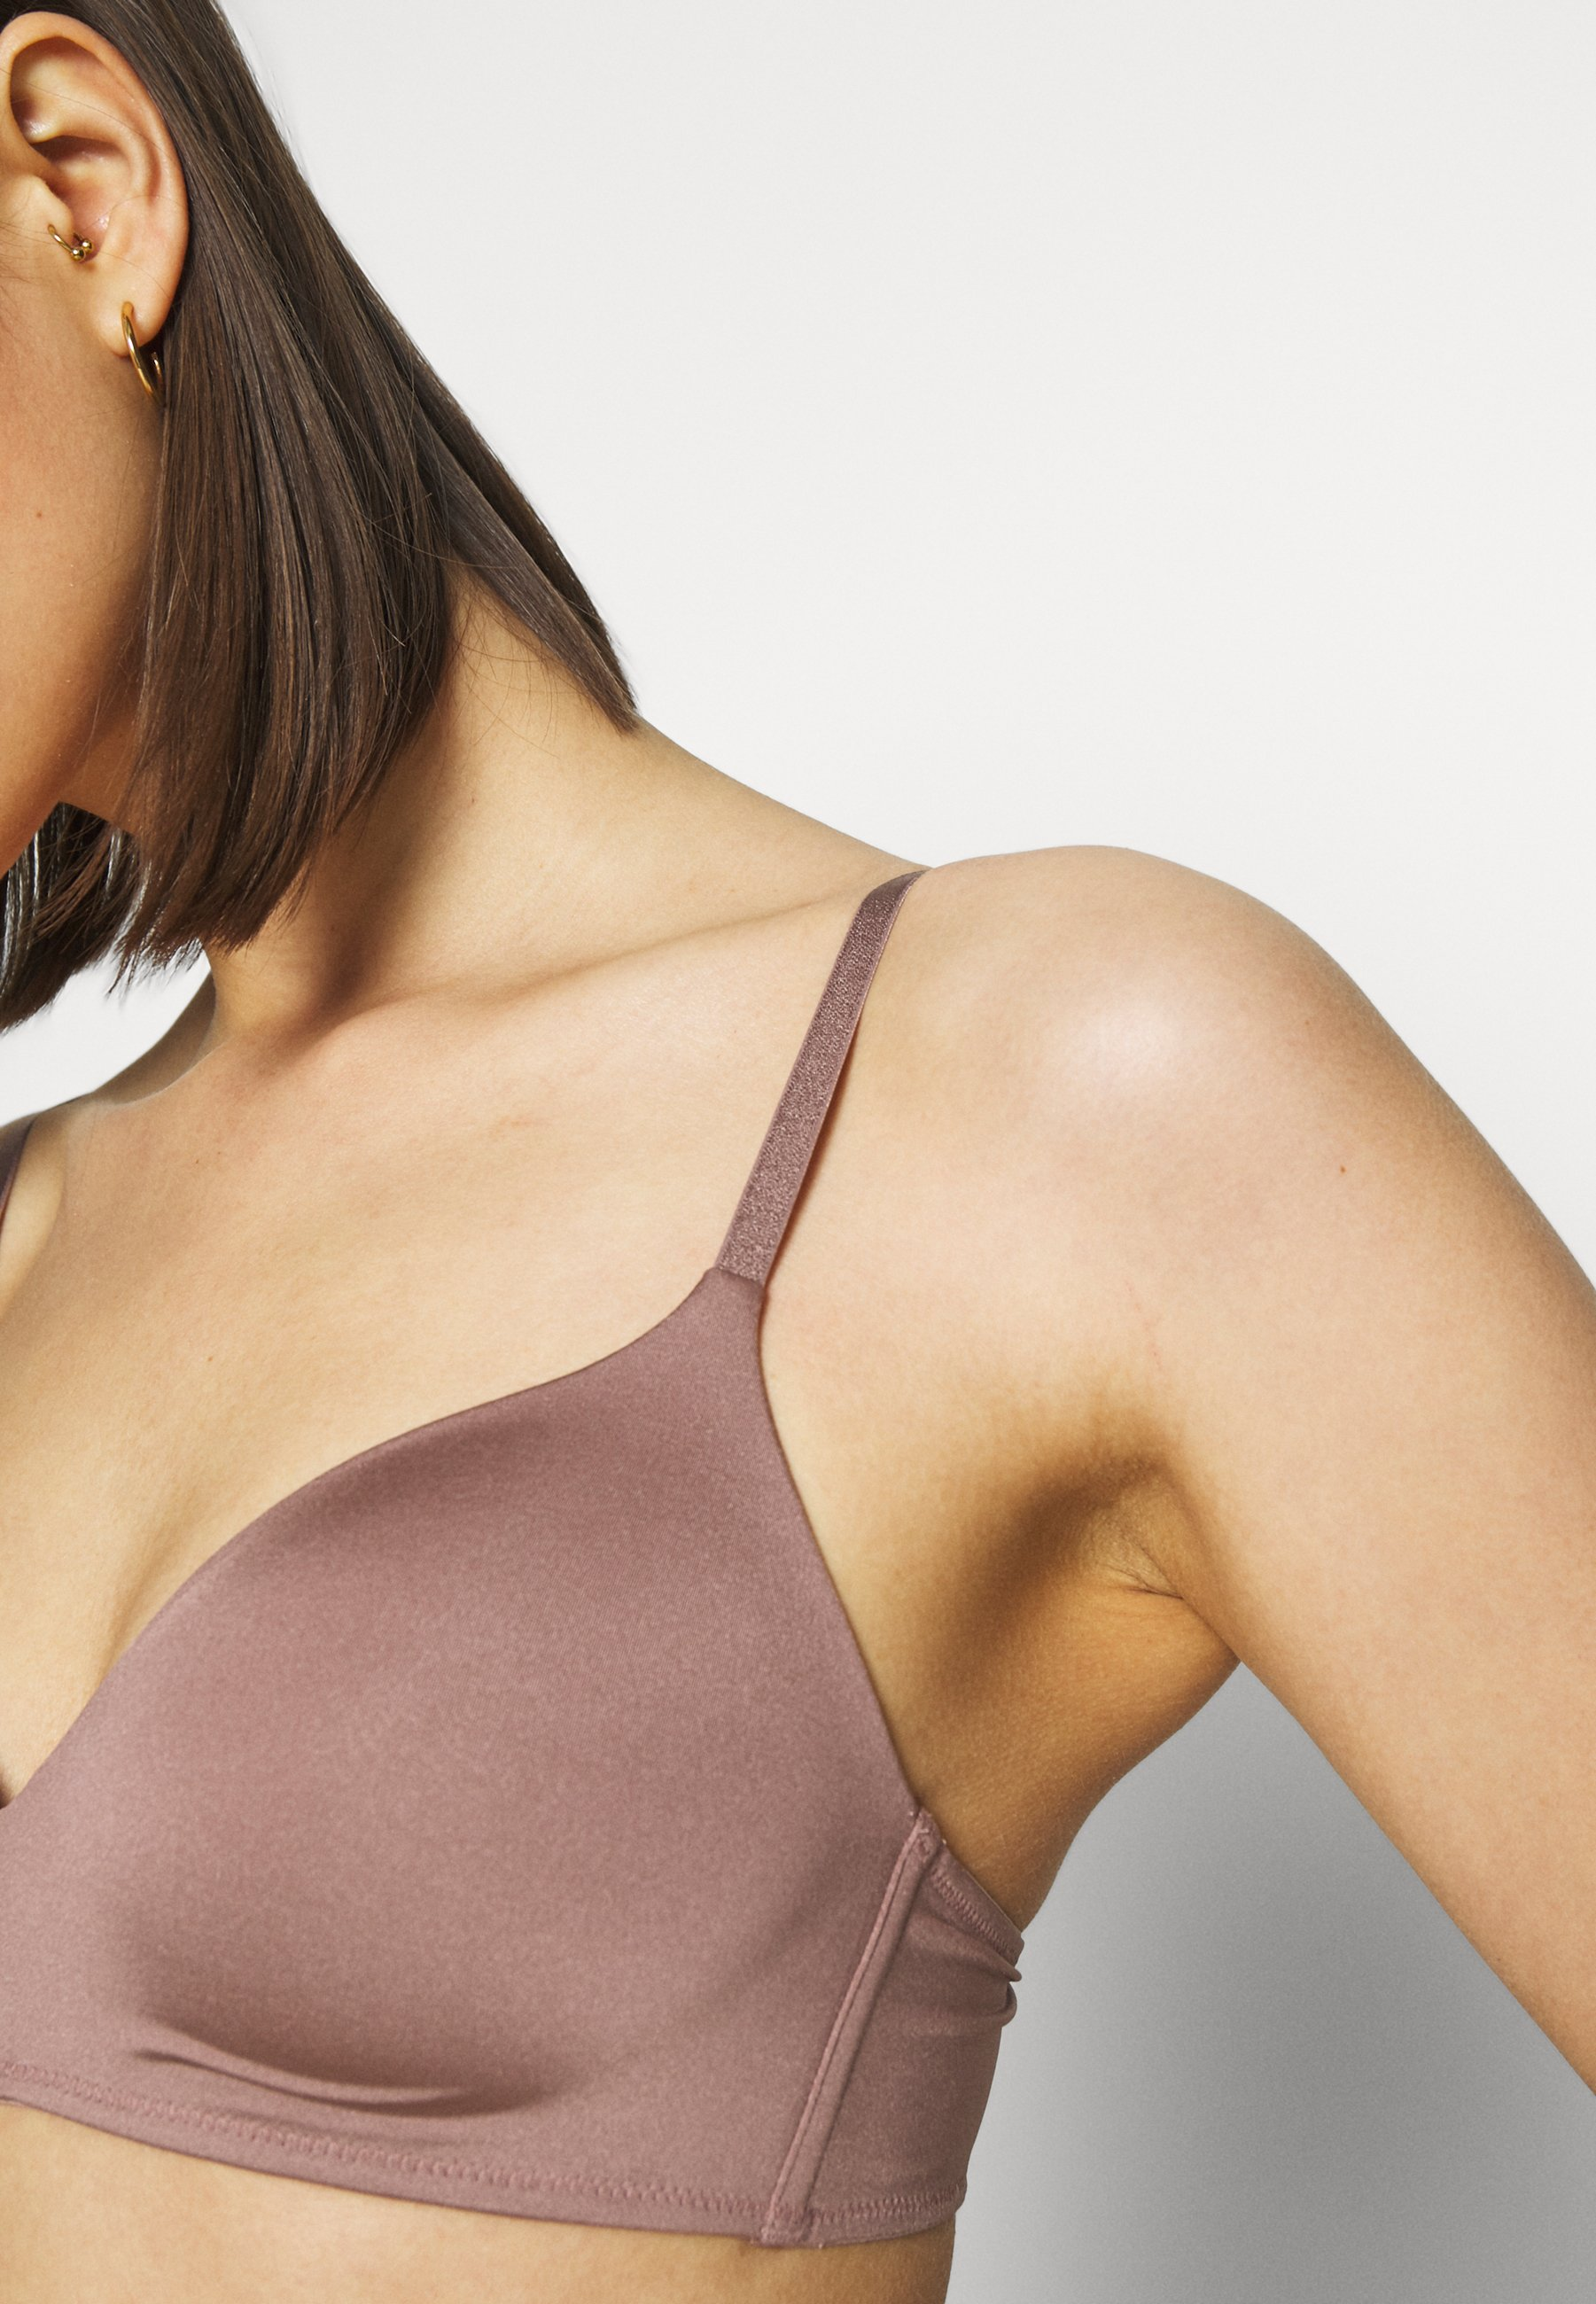 Women FLIRT SHINY MICRO BRA - T-shirt bra